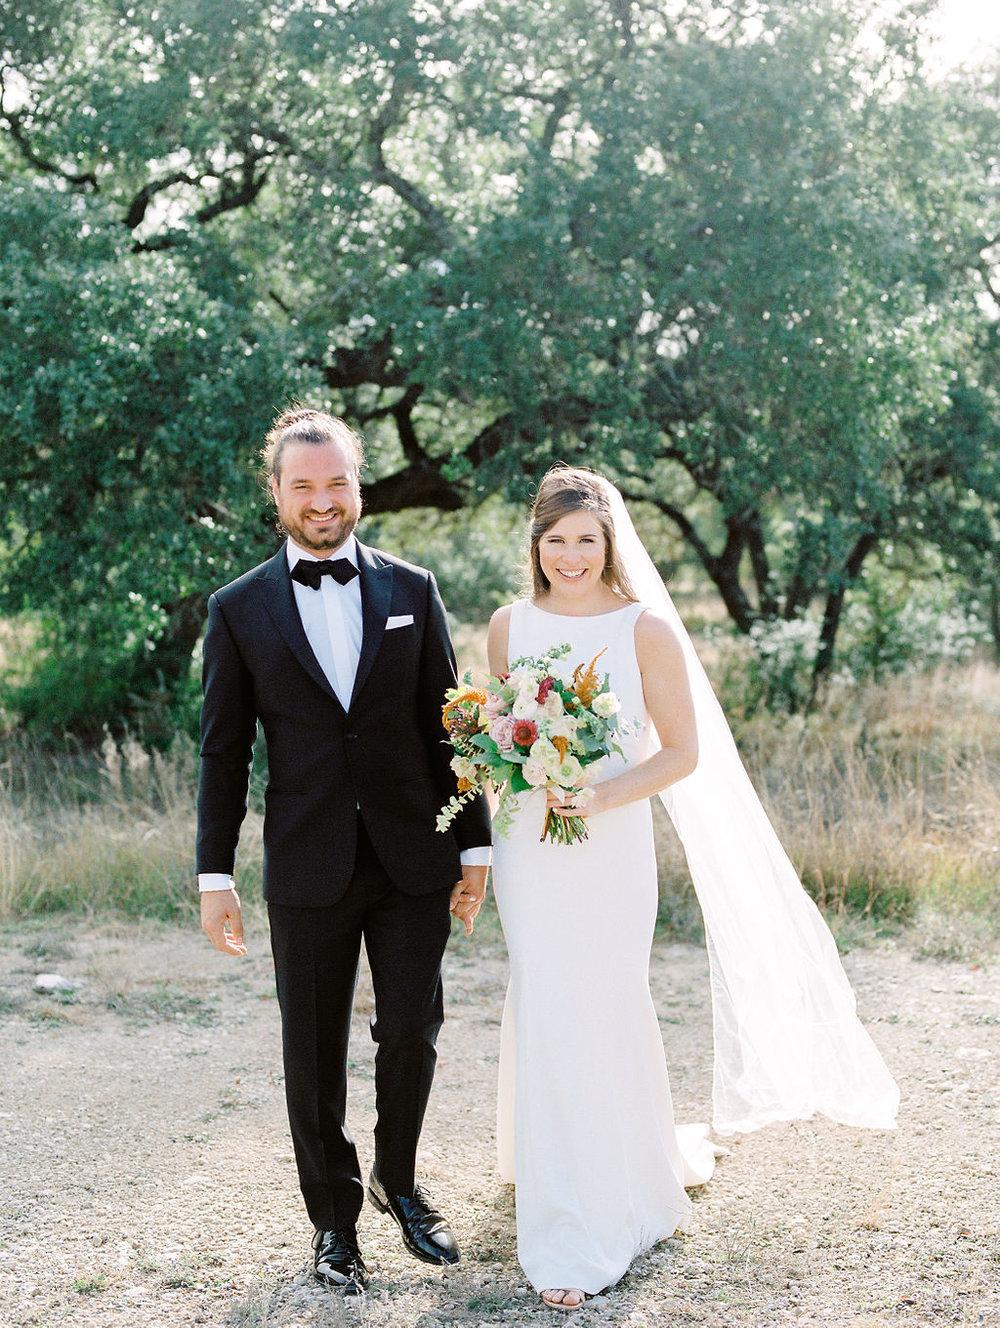 Austin-Texas-Wedding-Photographer-Addison-Grove-Film-36.jpg